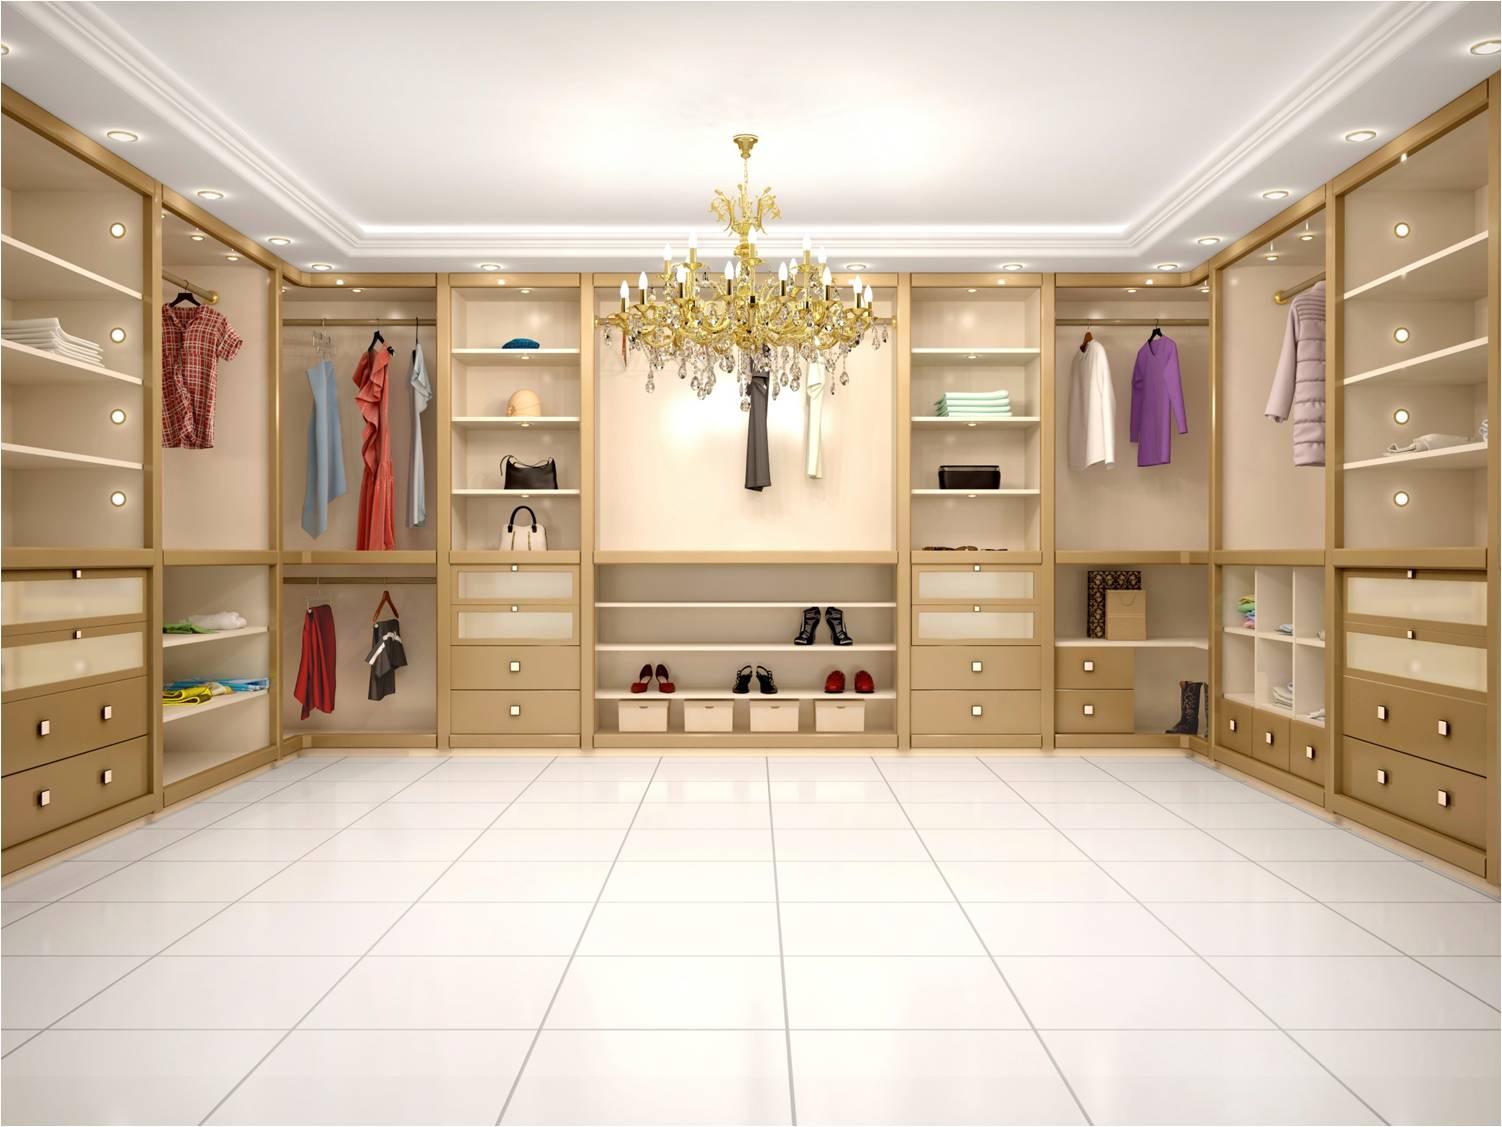 storage solutions for living rooms room renovation ideas closets - spacesolutionsaz.com